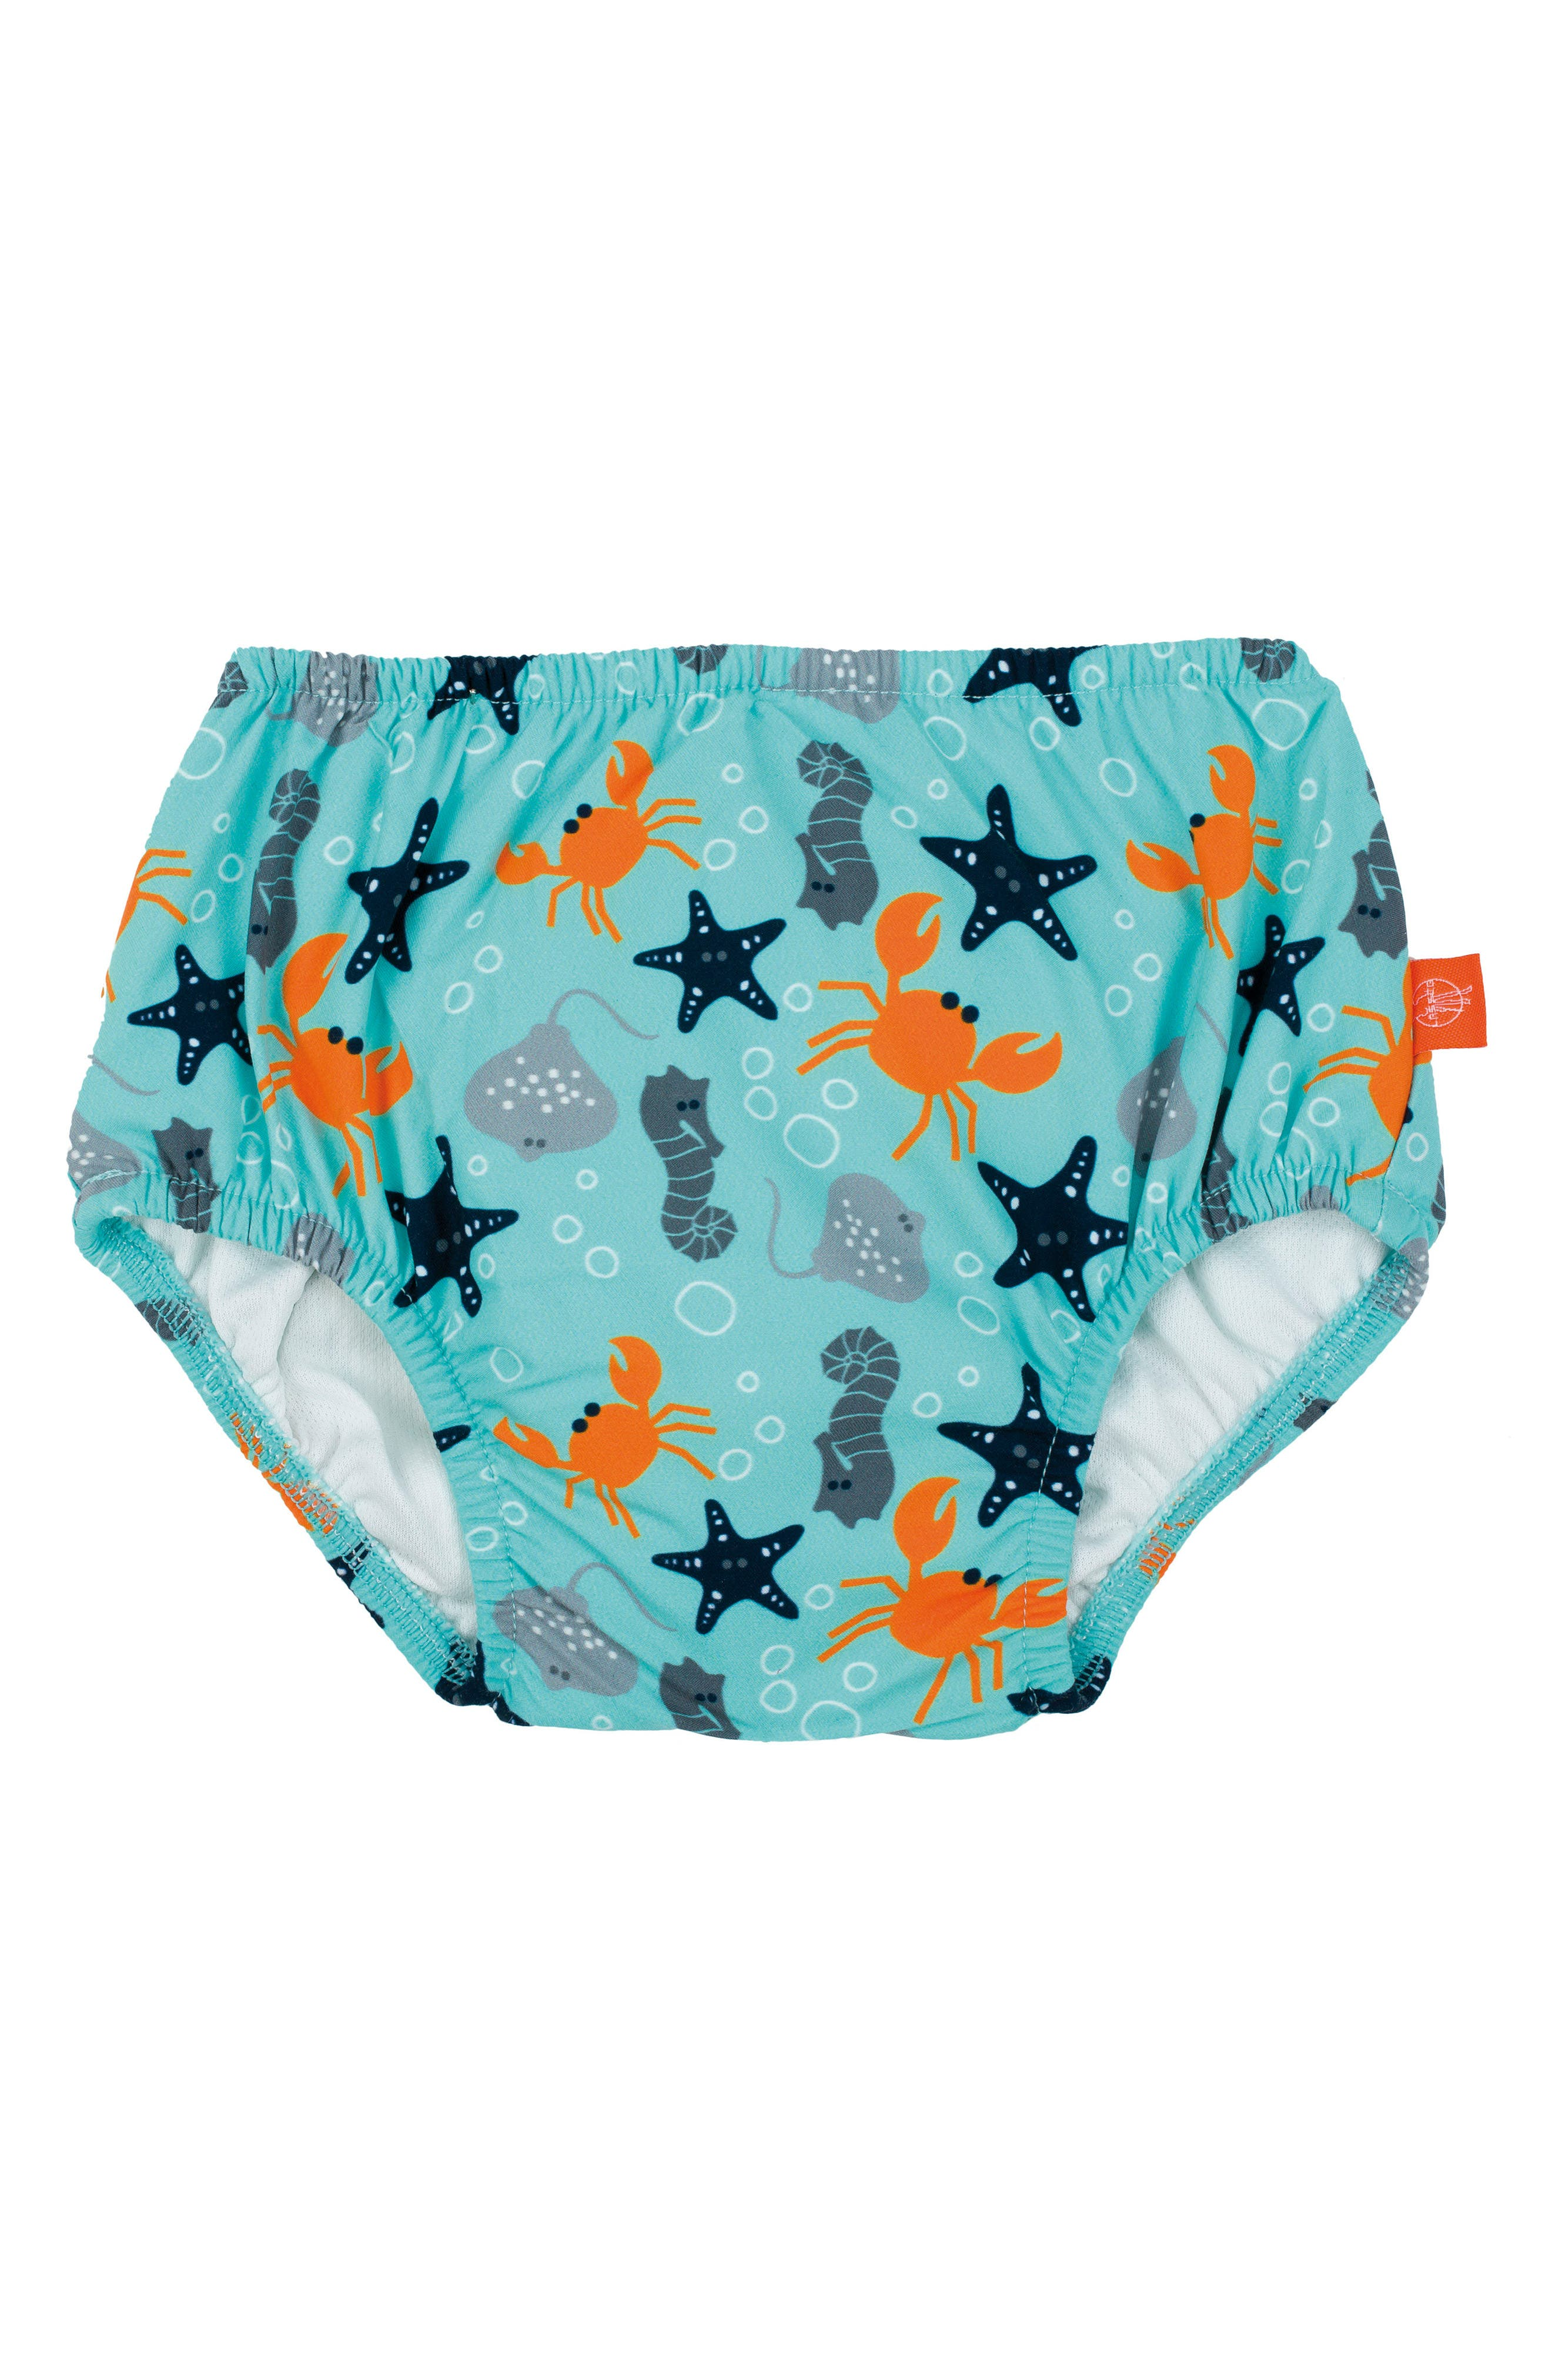 Star Fish Swim Diaper Cover,                         Main,                         color, 400